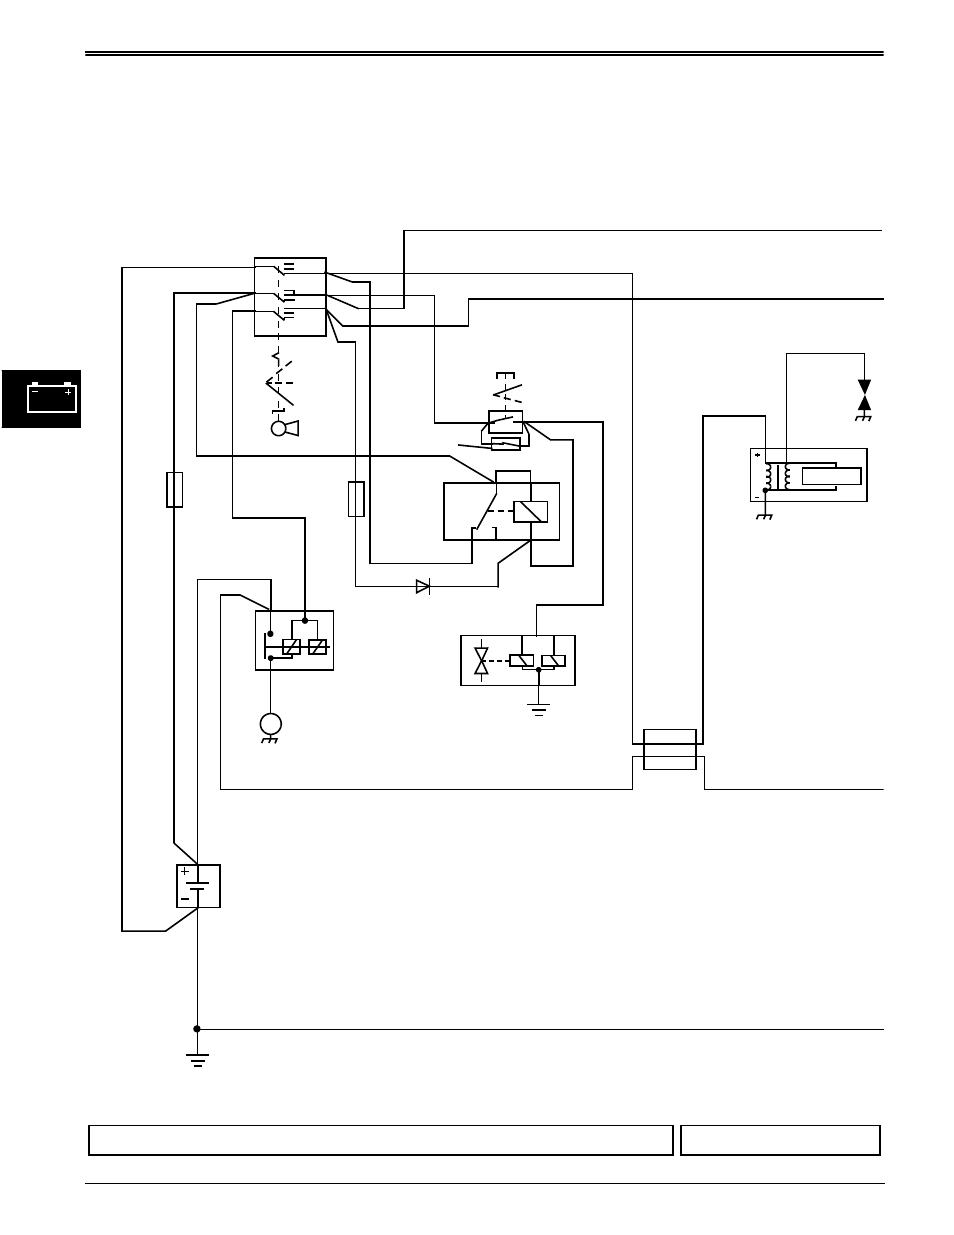 medium resolution of wiring schematics john deere stx38 user manual page 102 314